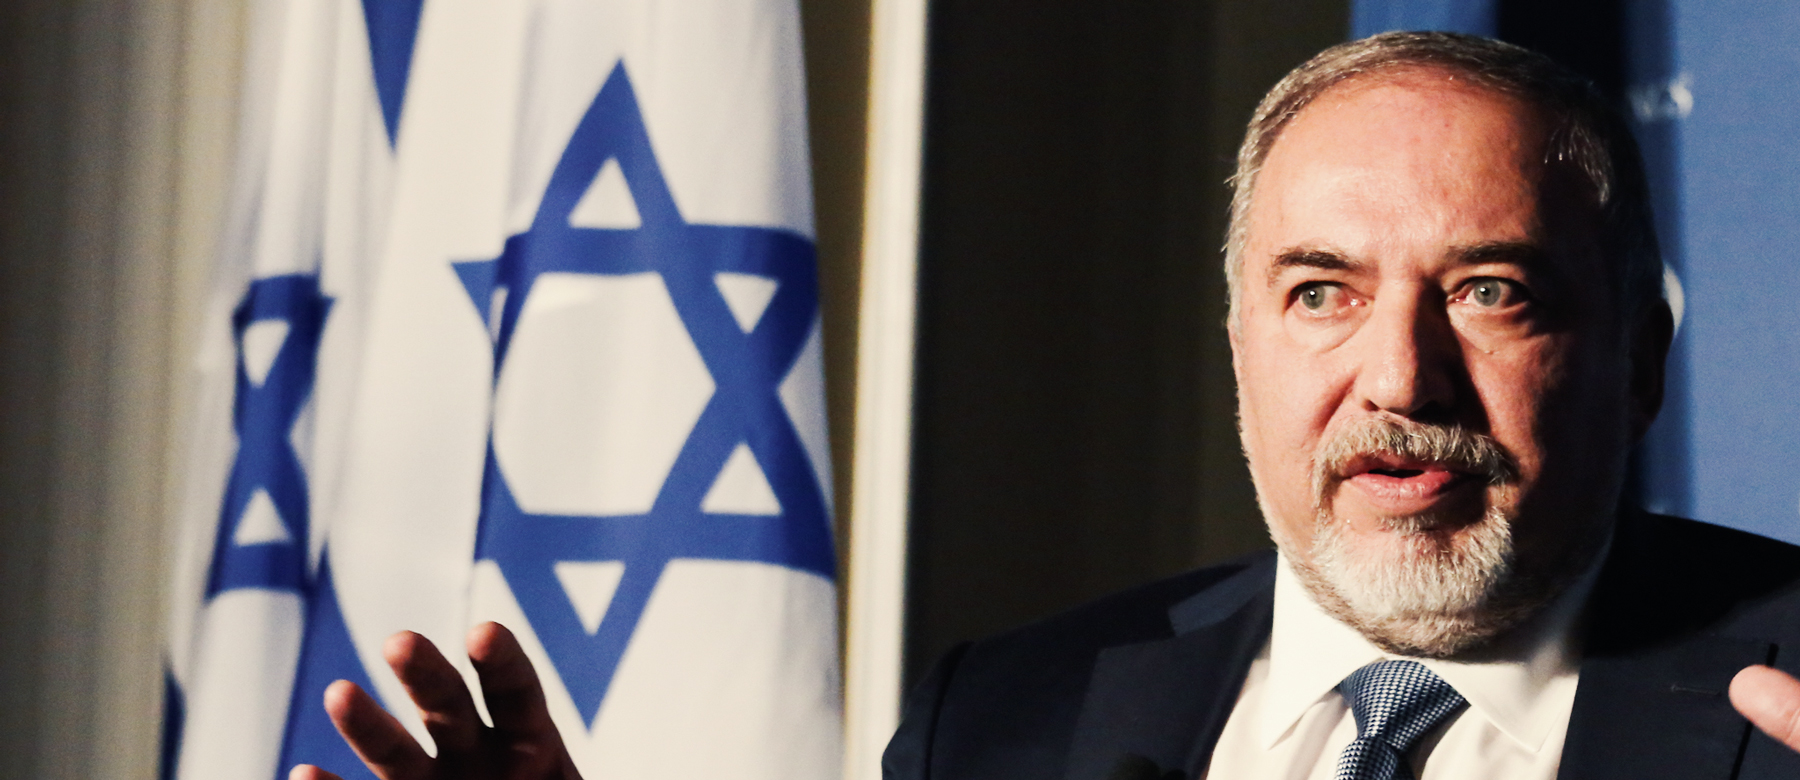 BREAKING: Israels rechtsaußen Verteidigungsminister Avigdor Lieberman tritt zurück